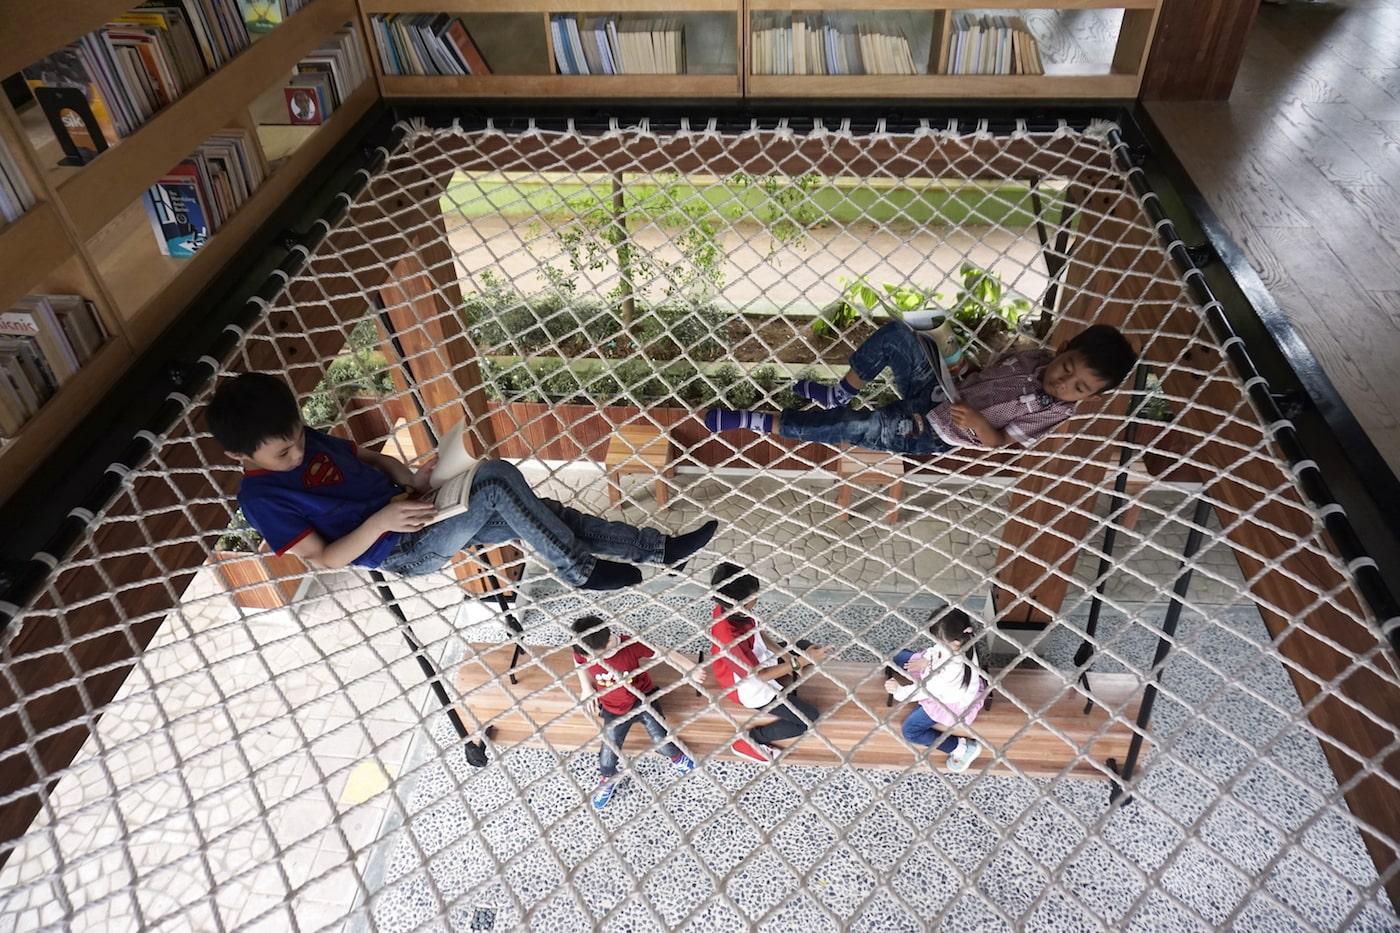 Kids sitting on rope hammock floor with kids sitting underneath